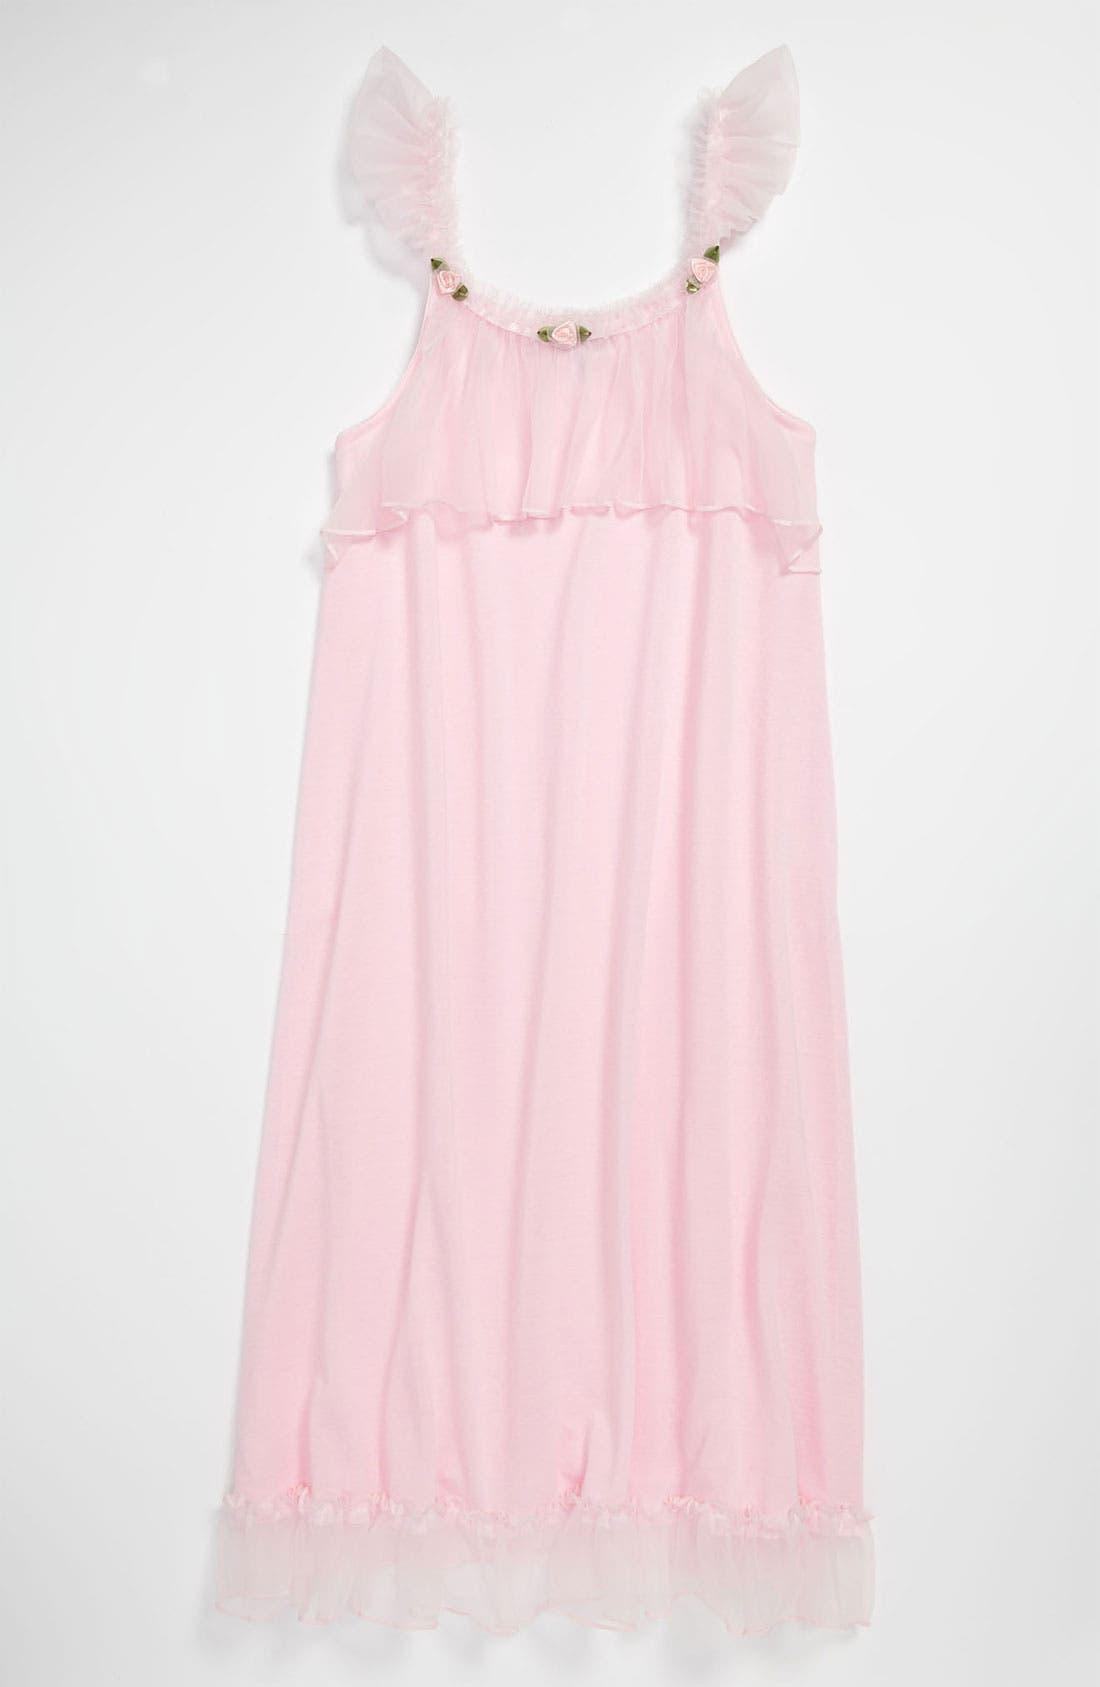 Alternate Image 1 Selected - Laura Dare Nightgown (Big Girls)